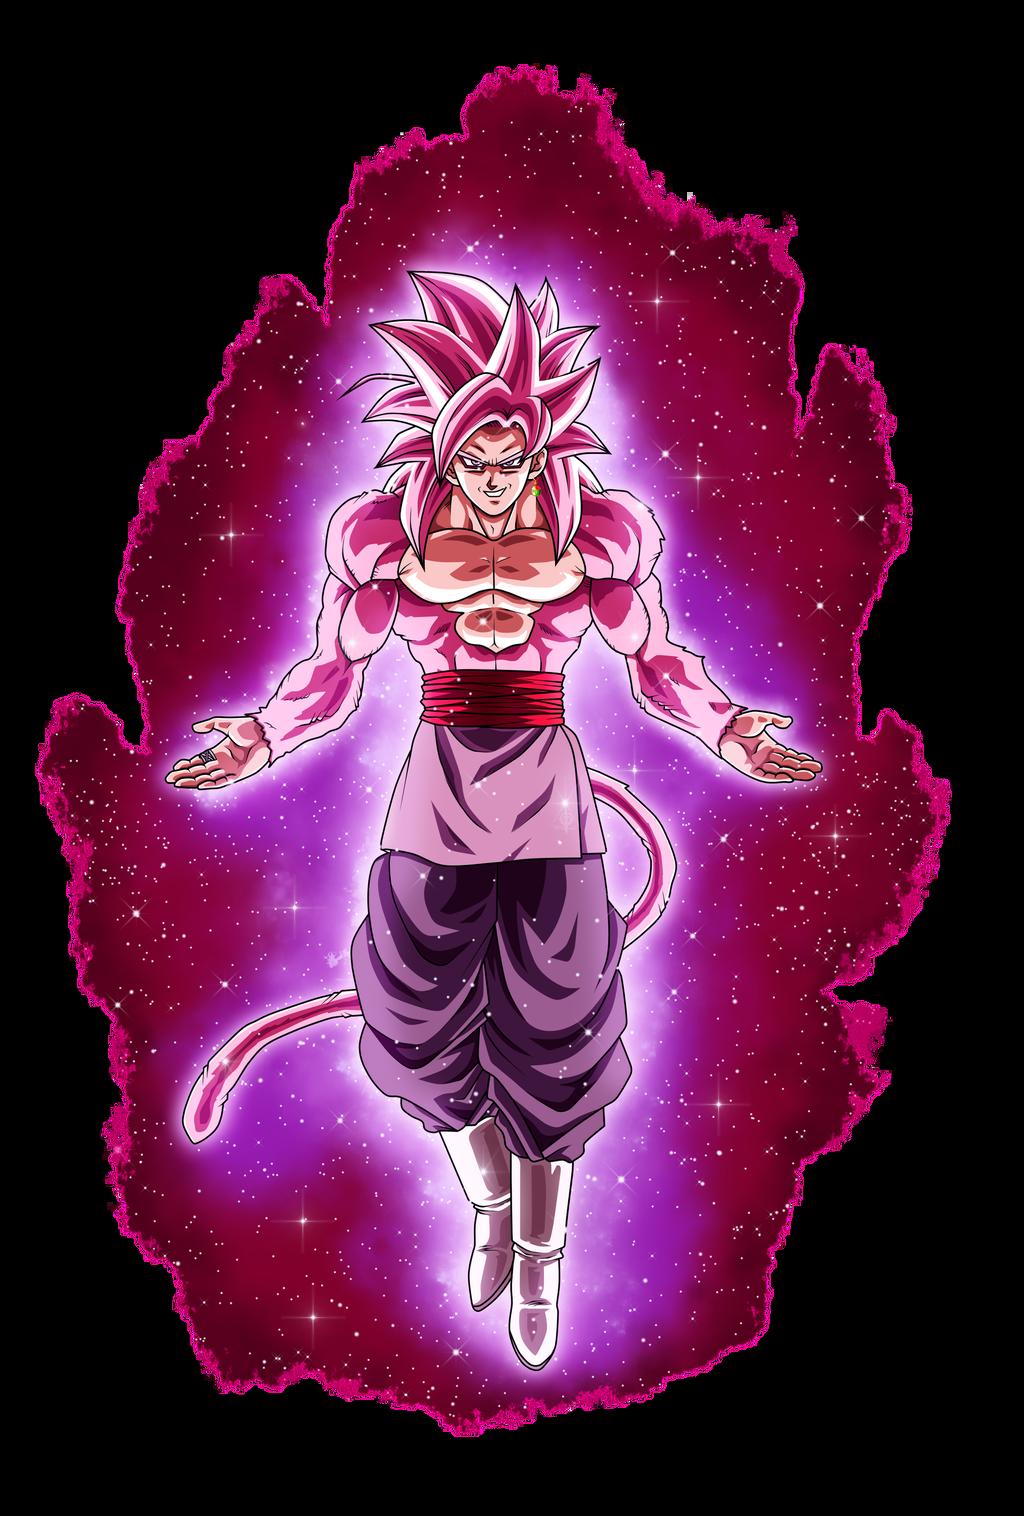 Black Goku Ssj4 By Lucario Strike Anime Dragon Ball Super Dragon Ball Dragon Ball Super Goku